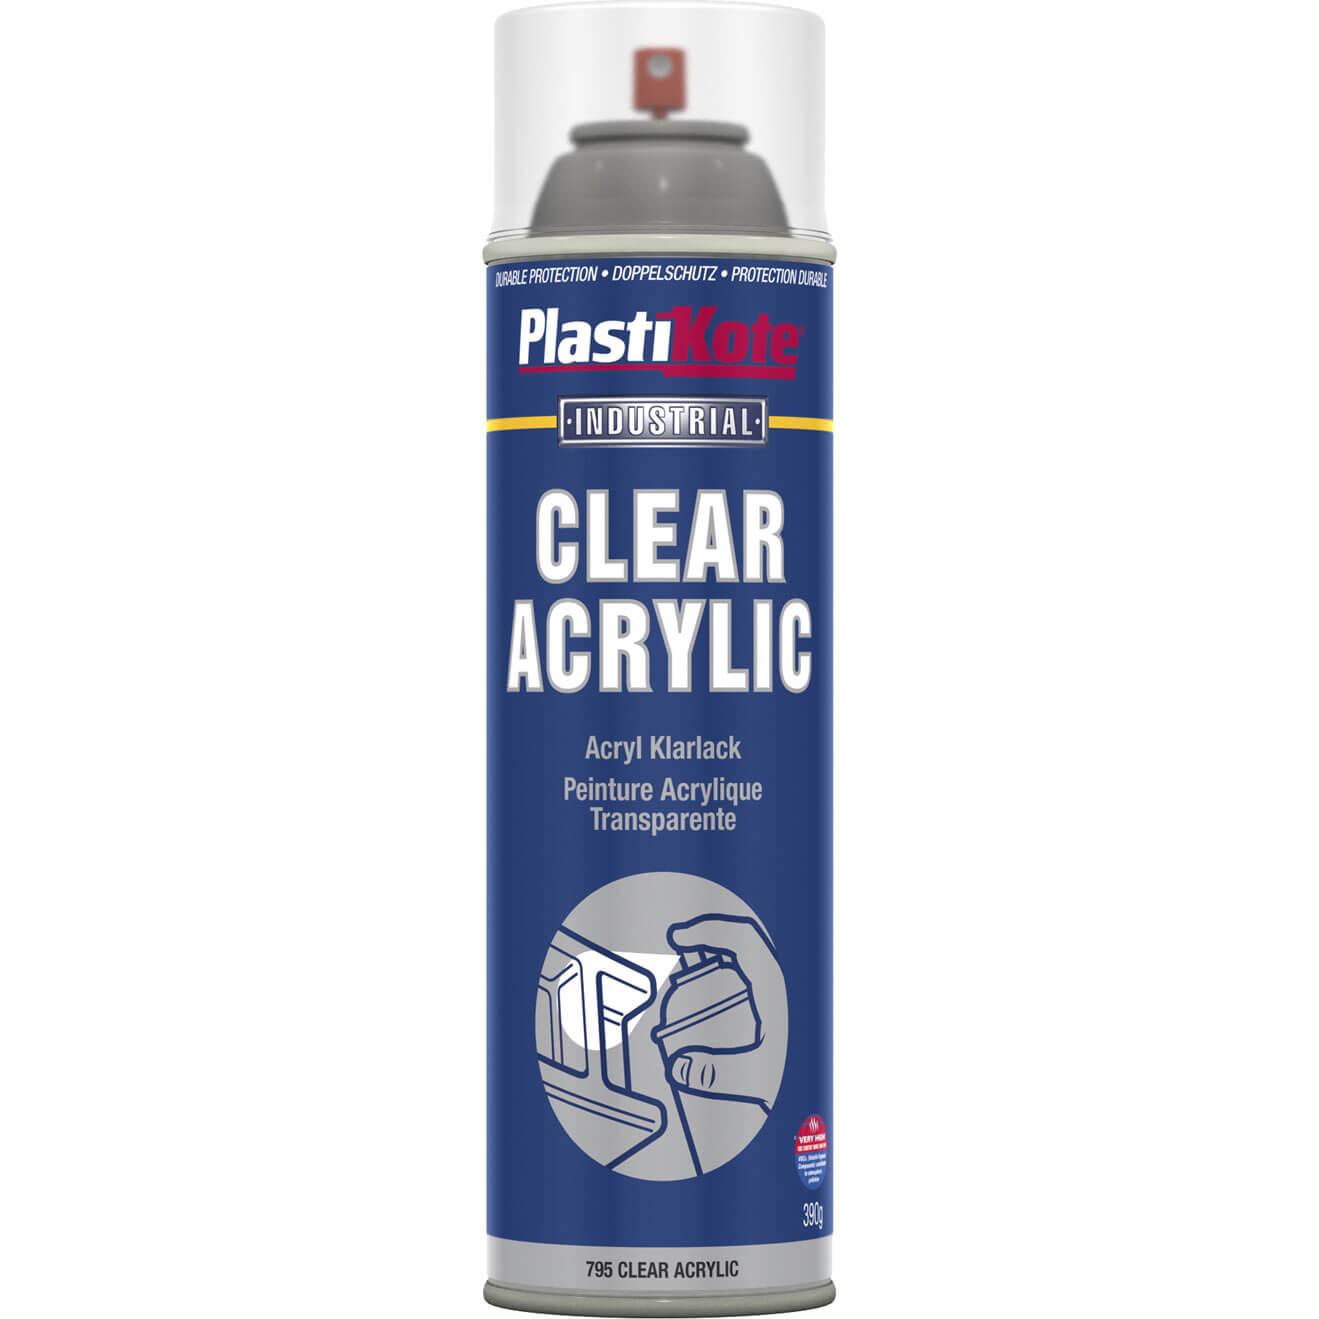 Image of Plastikote Industrial Clear Acrylic Aerosol Spray Paint 500ml